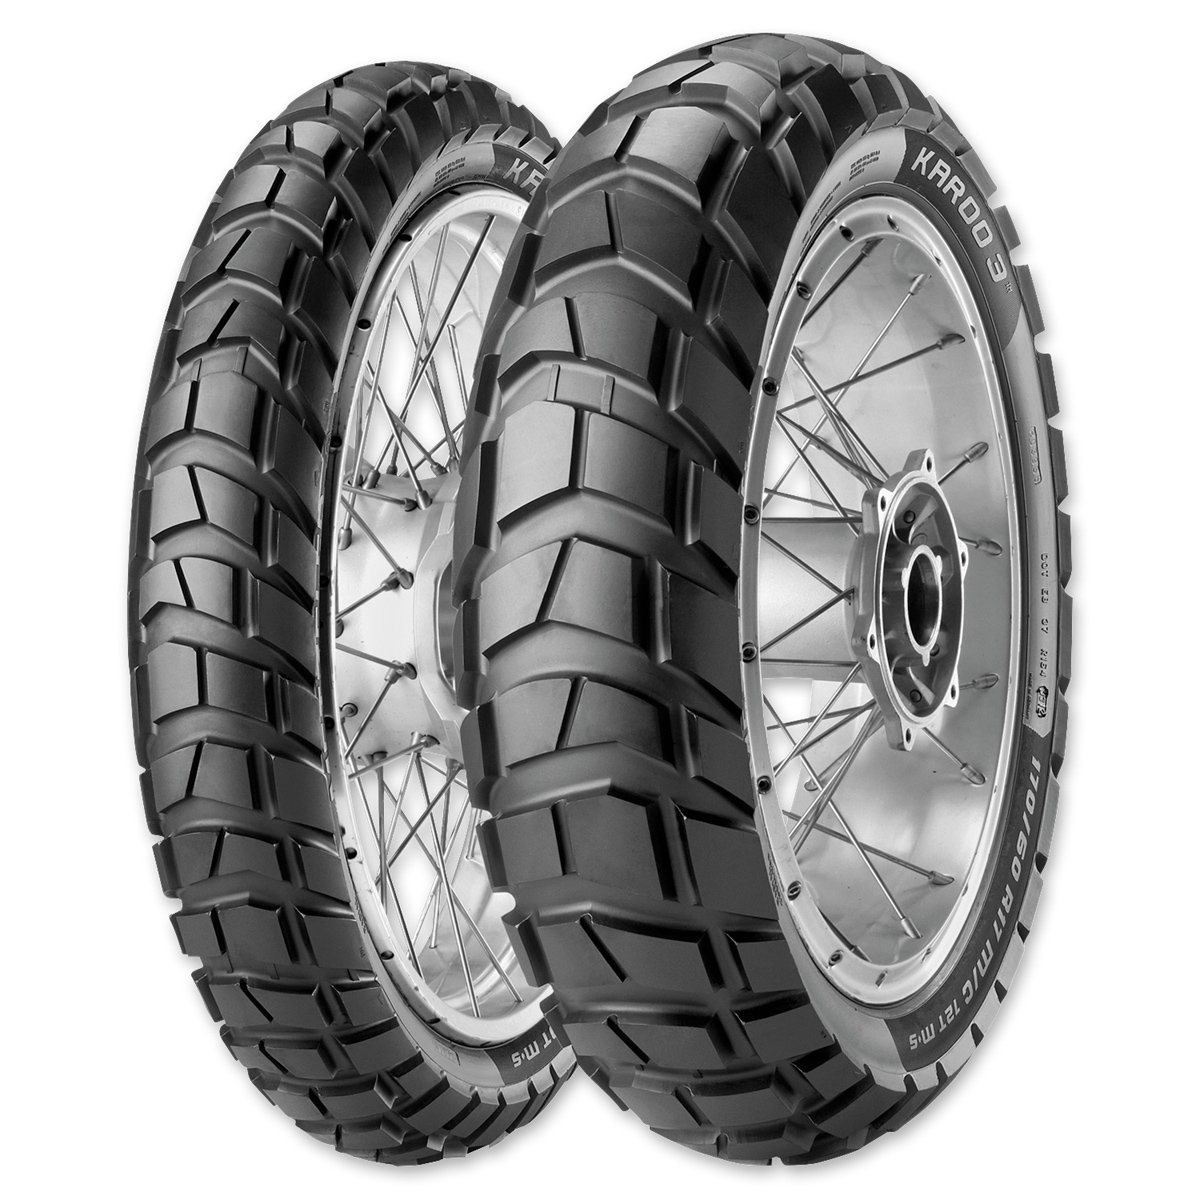 Metzeler Karoo 3 90/90-21 Front Tire 2316200